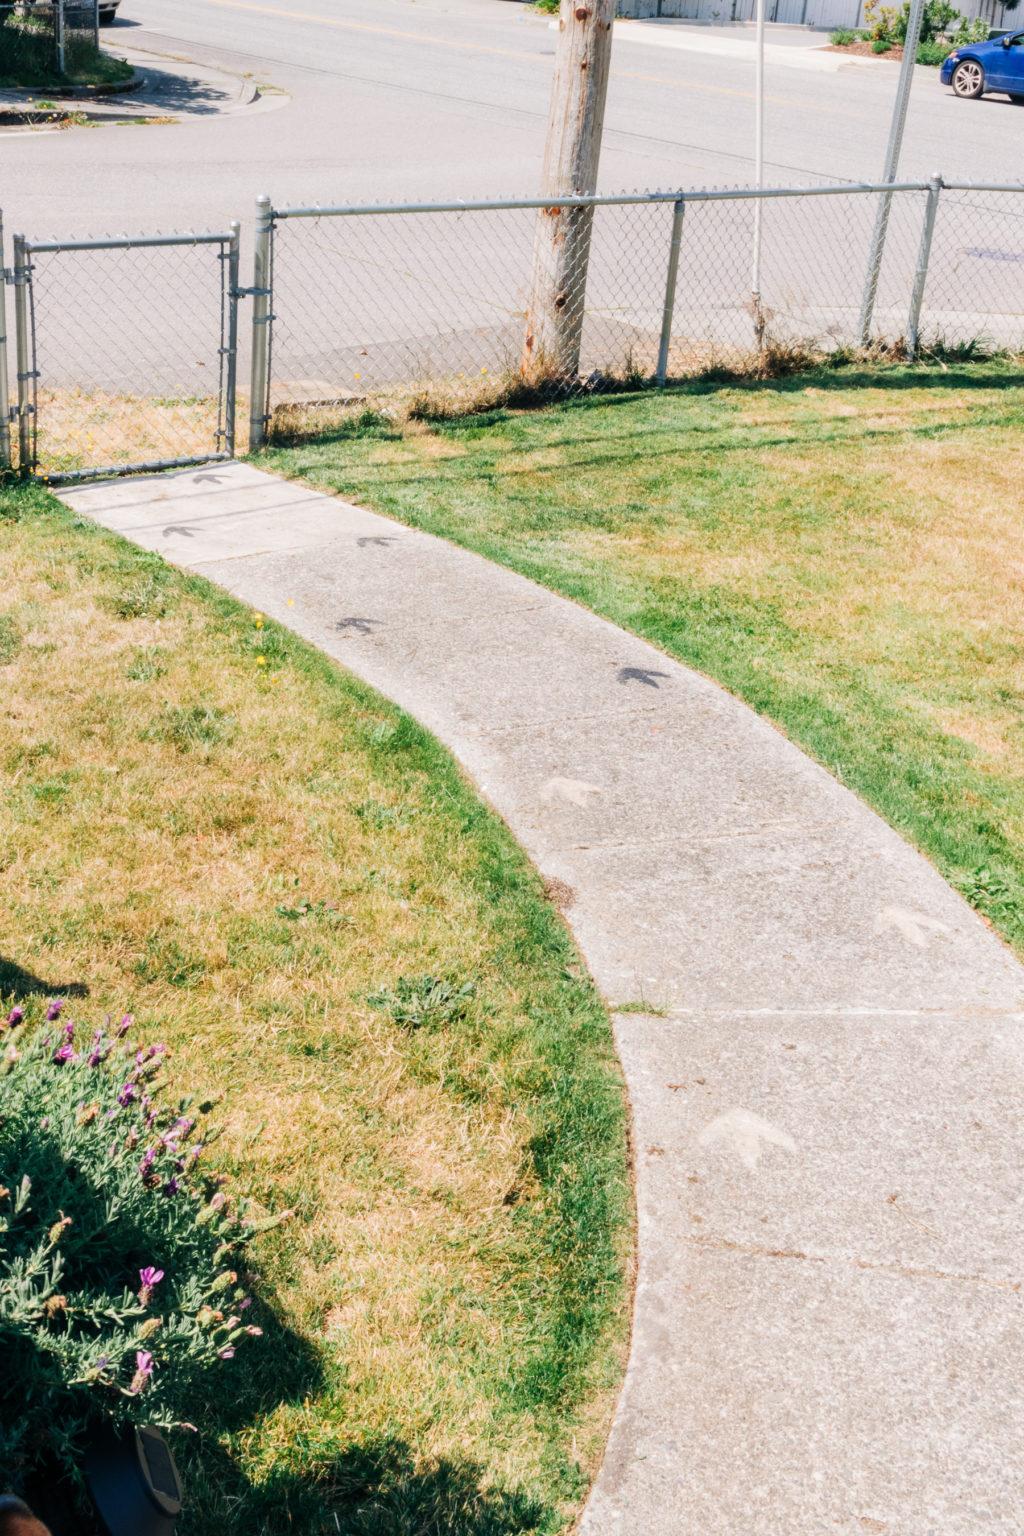 Dinosaur tracks on a walkway